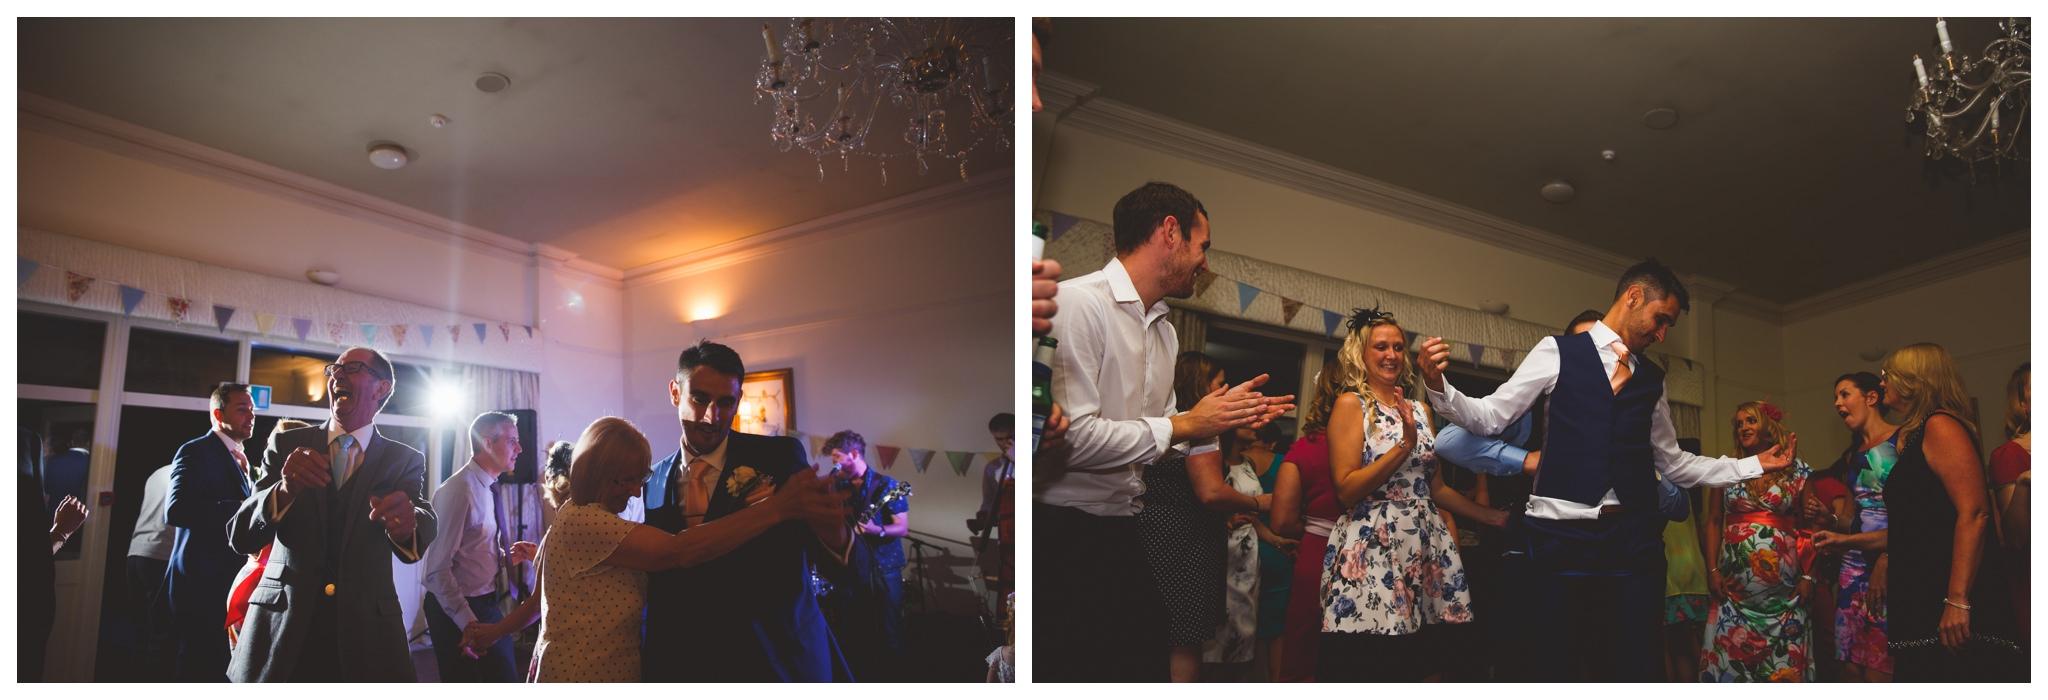 Richard Savage Photography - Wedding - Peterstone Court Brecon - 2016-05-11_0065